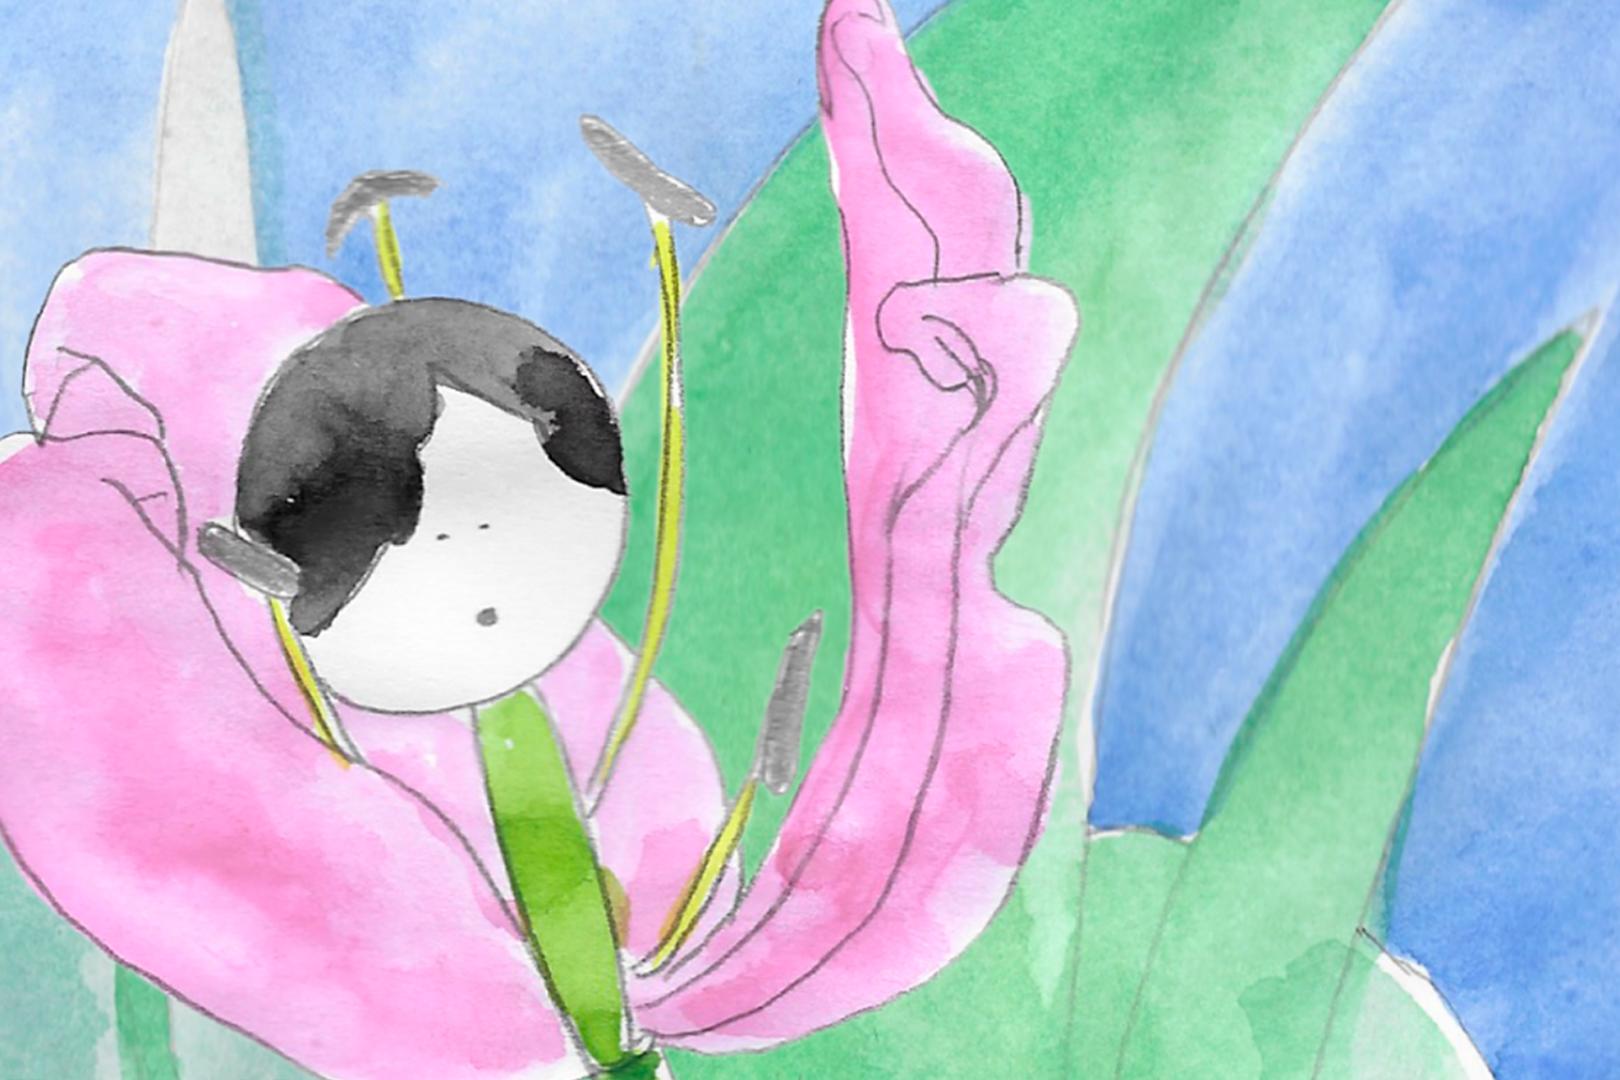 Animators in Conversation: Fiction vs Reality